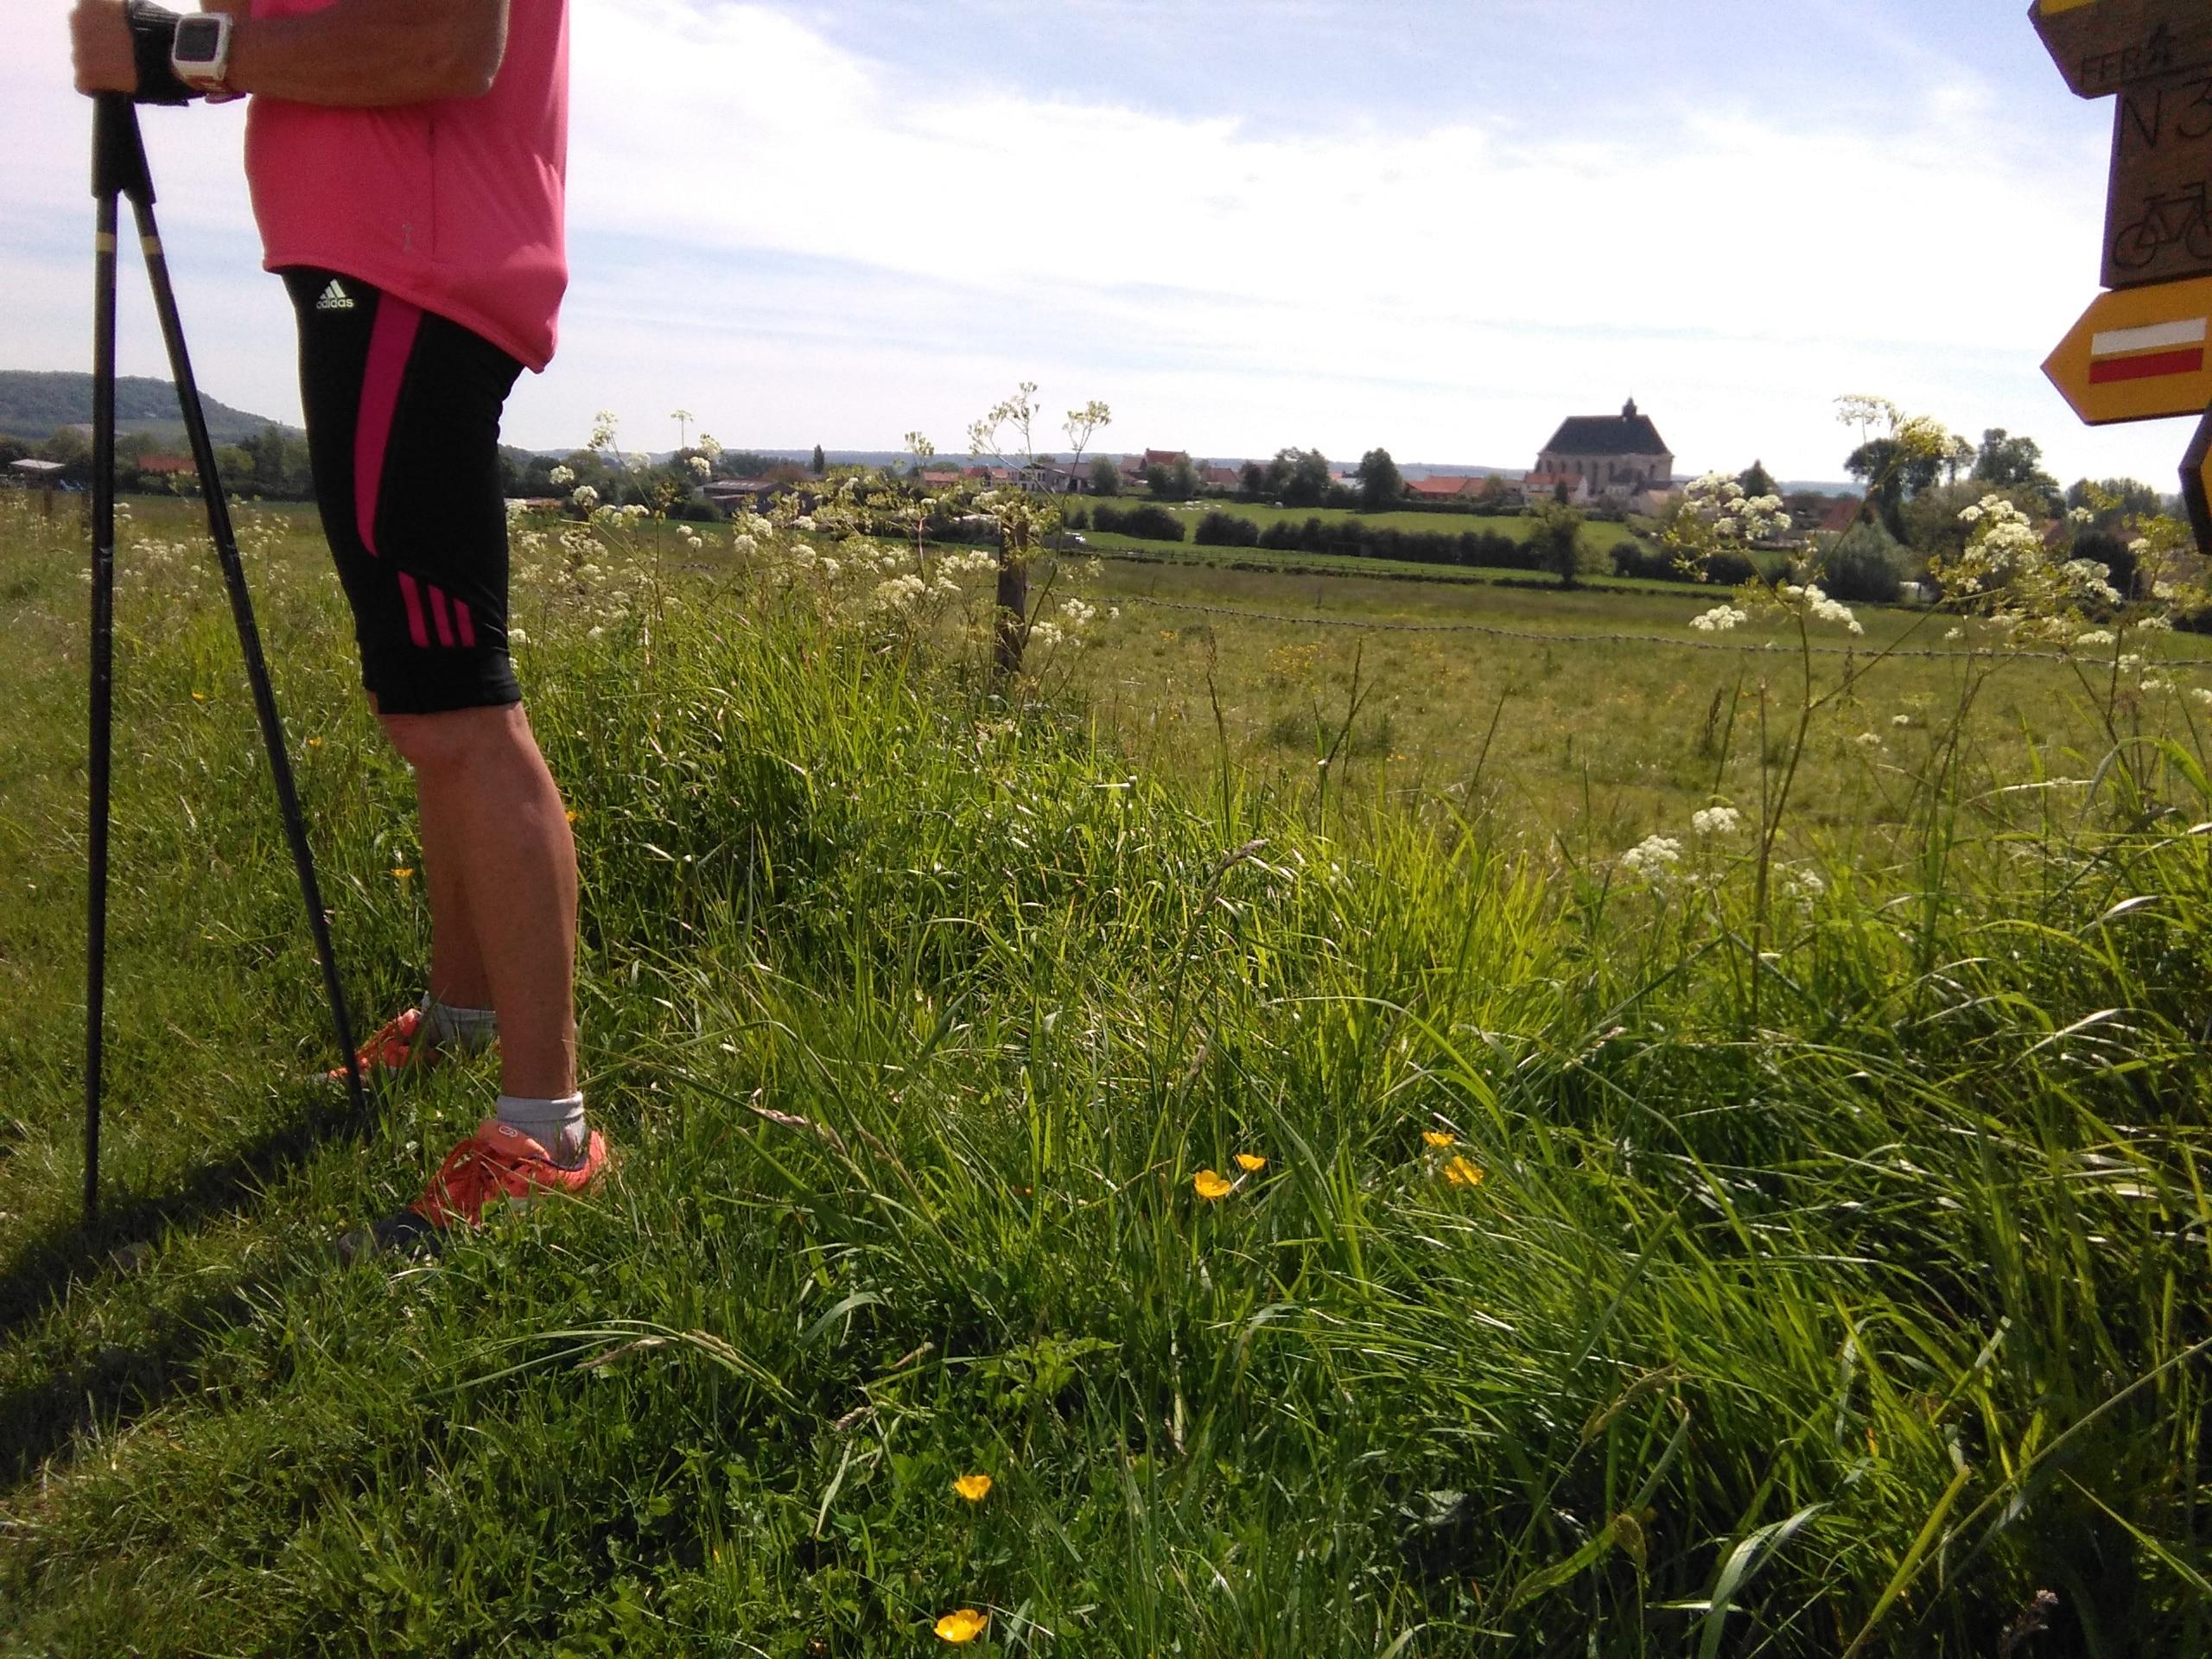 The Nordic Walking